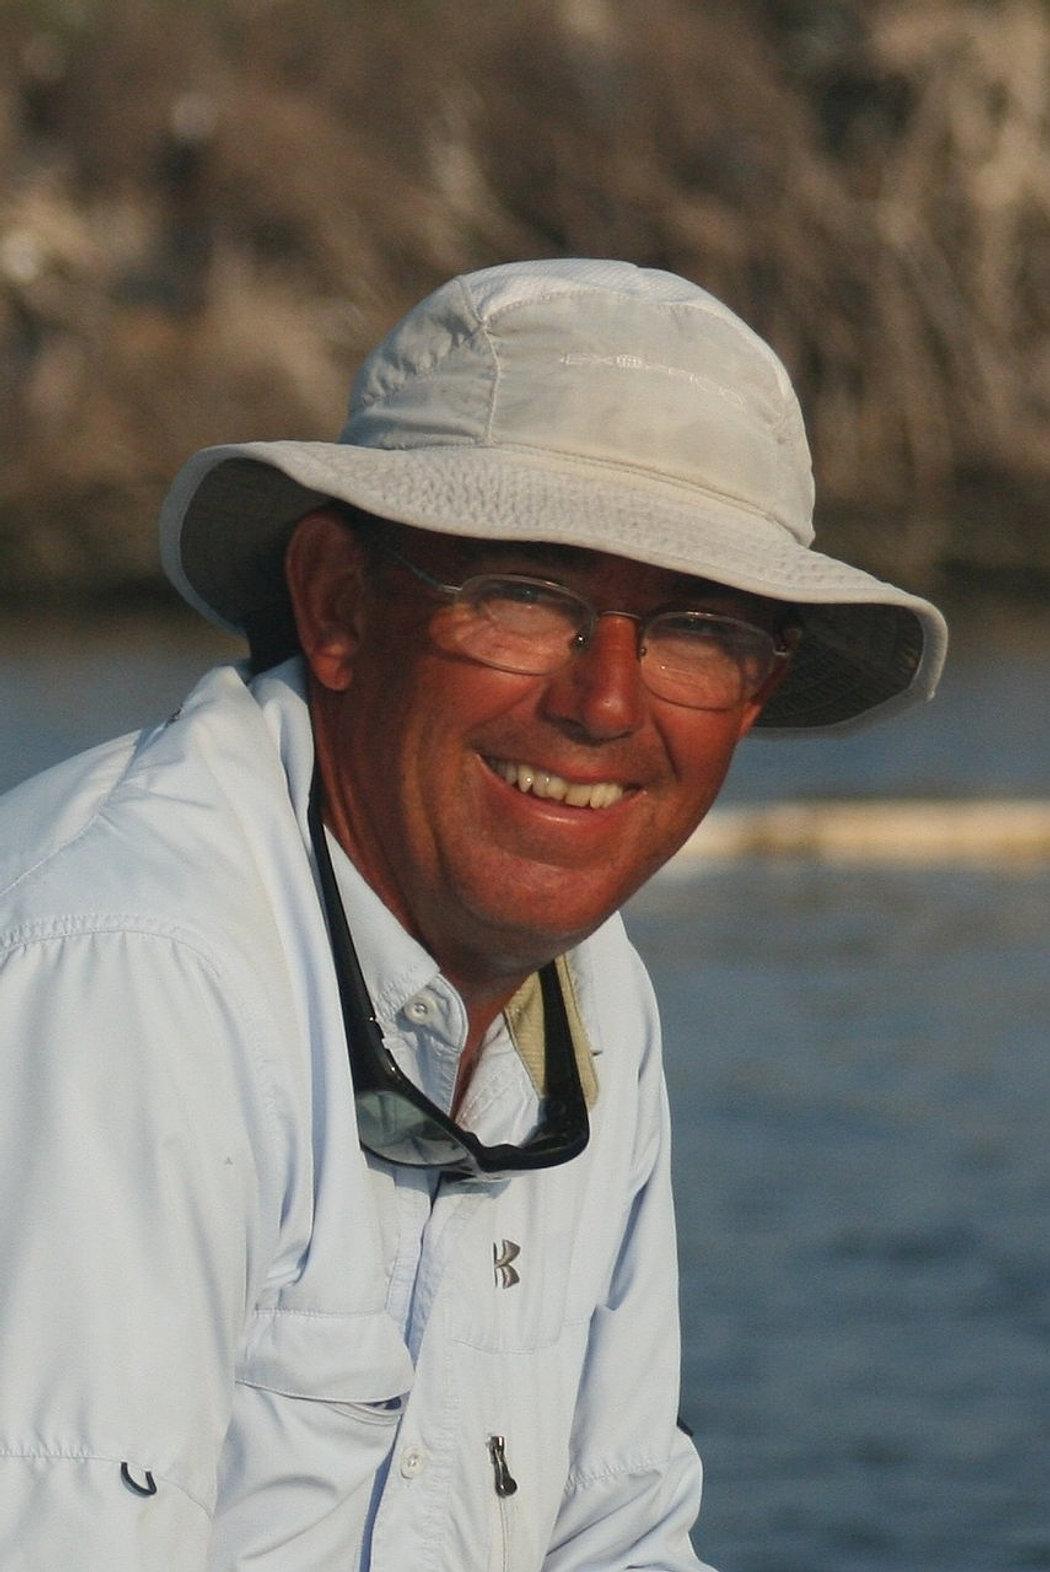 Capt. Danny Wray